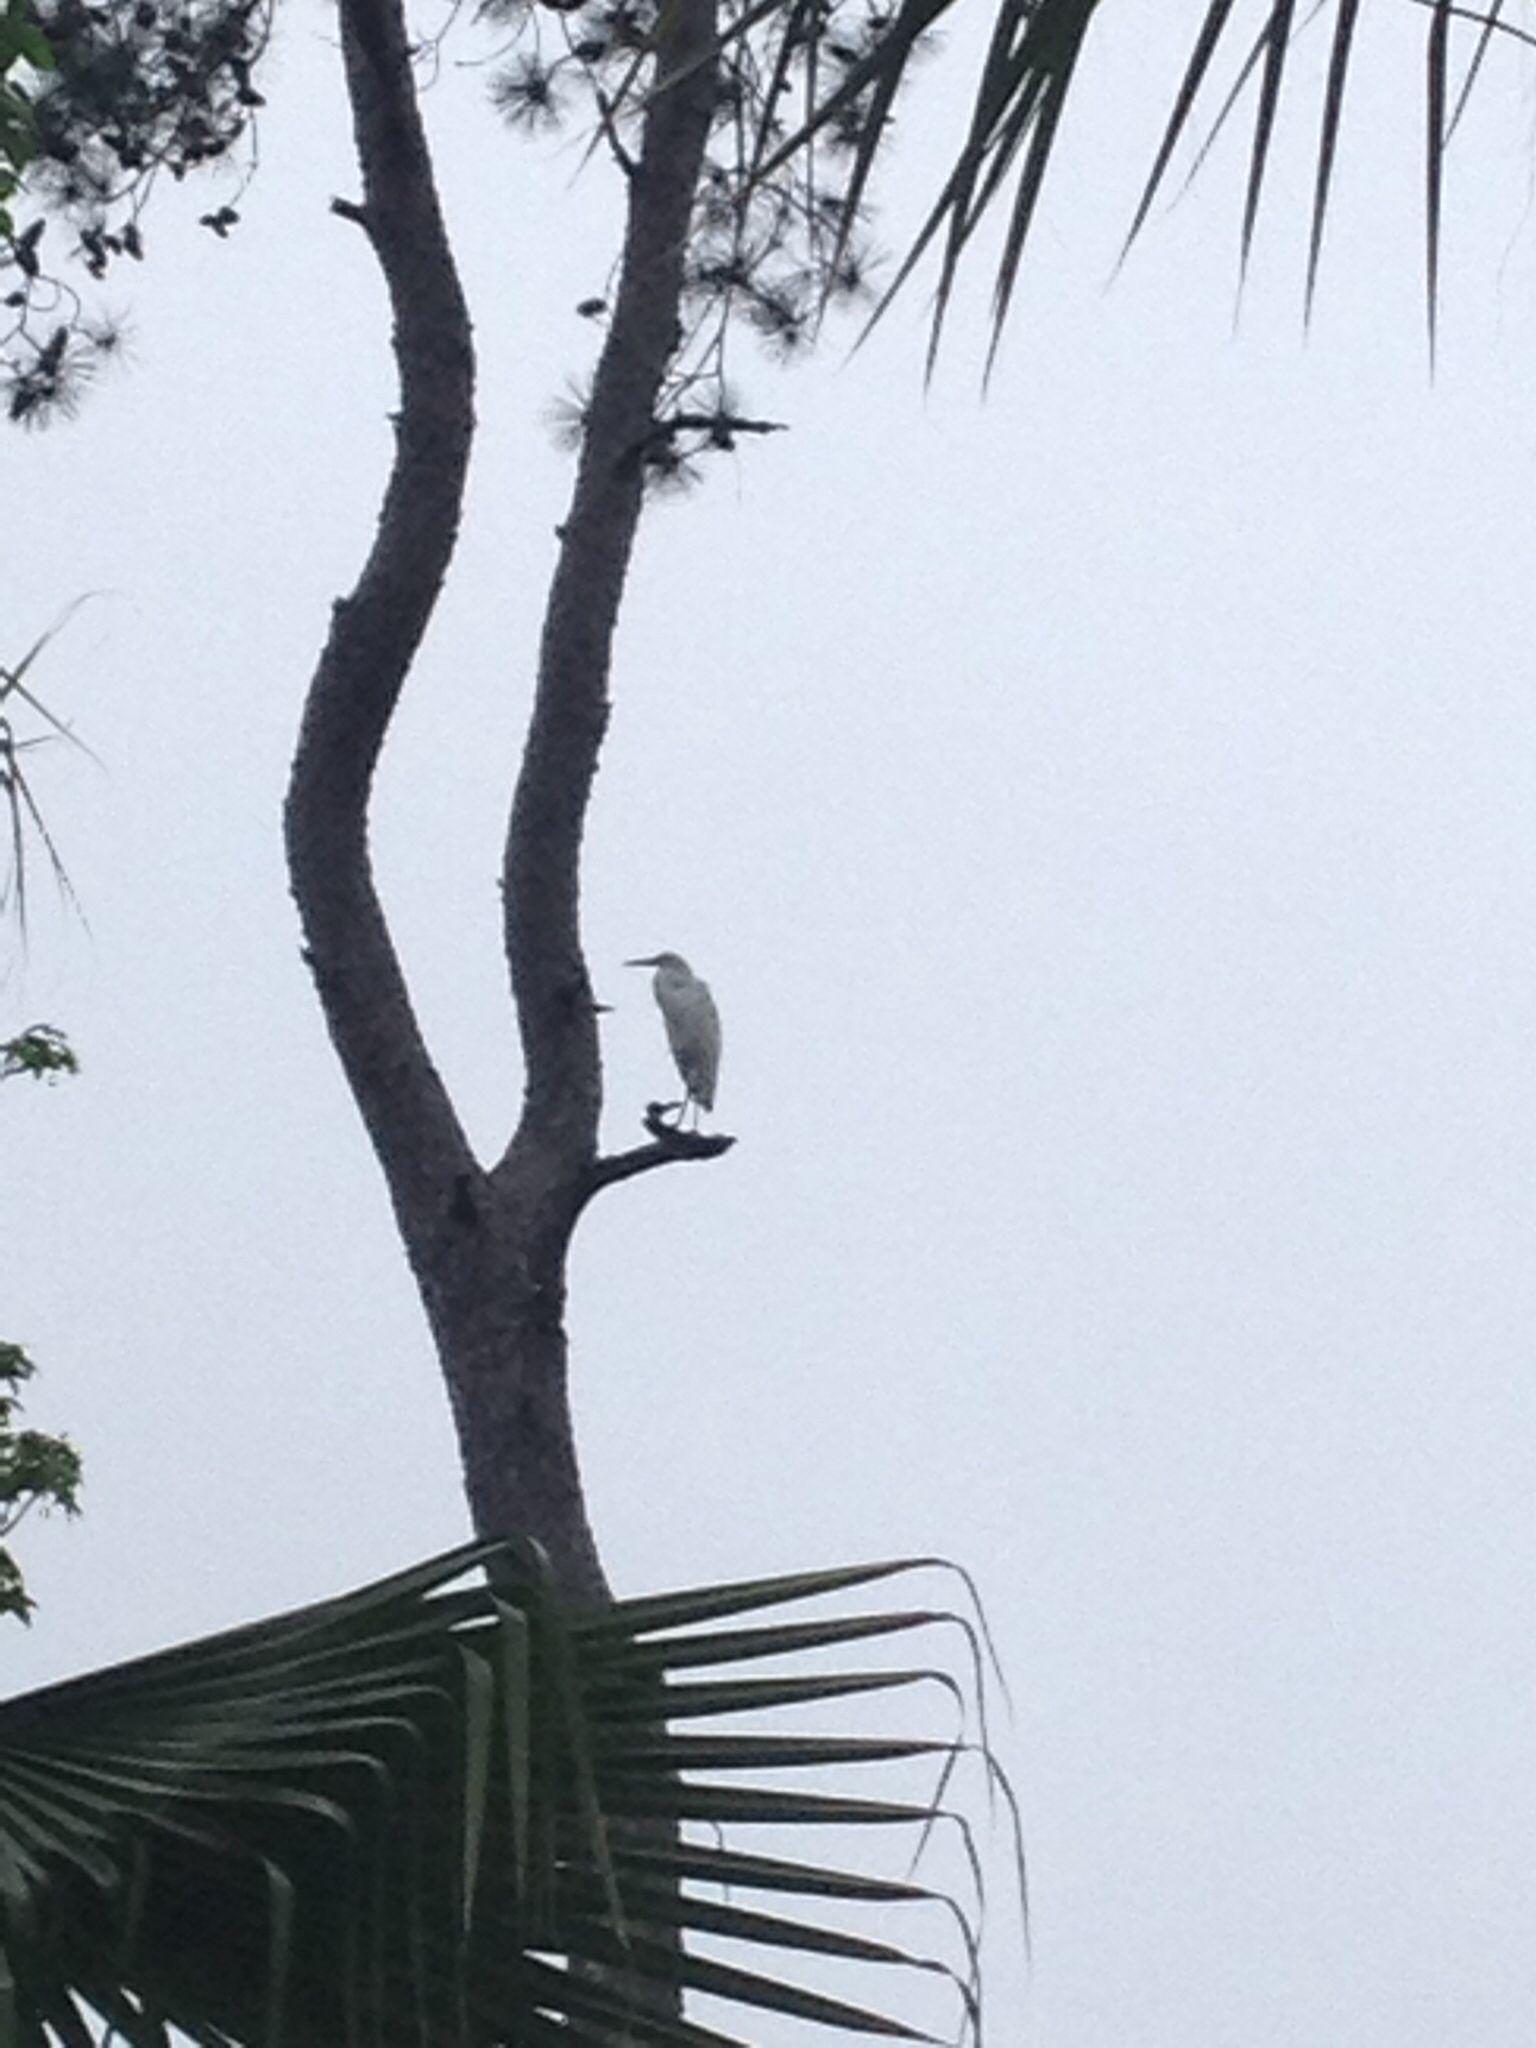 Heron perched on tree limb favorite places heron snapshots